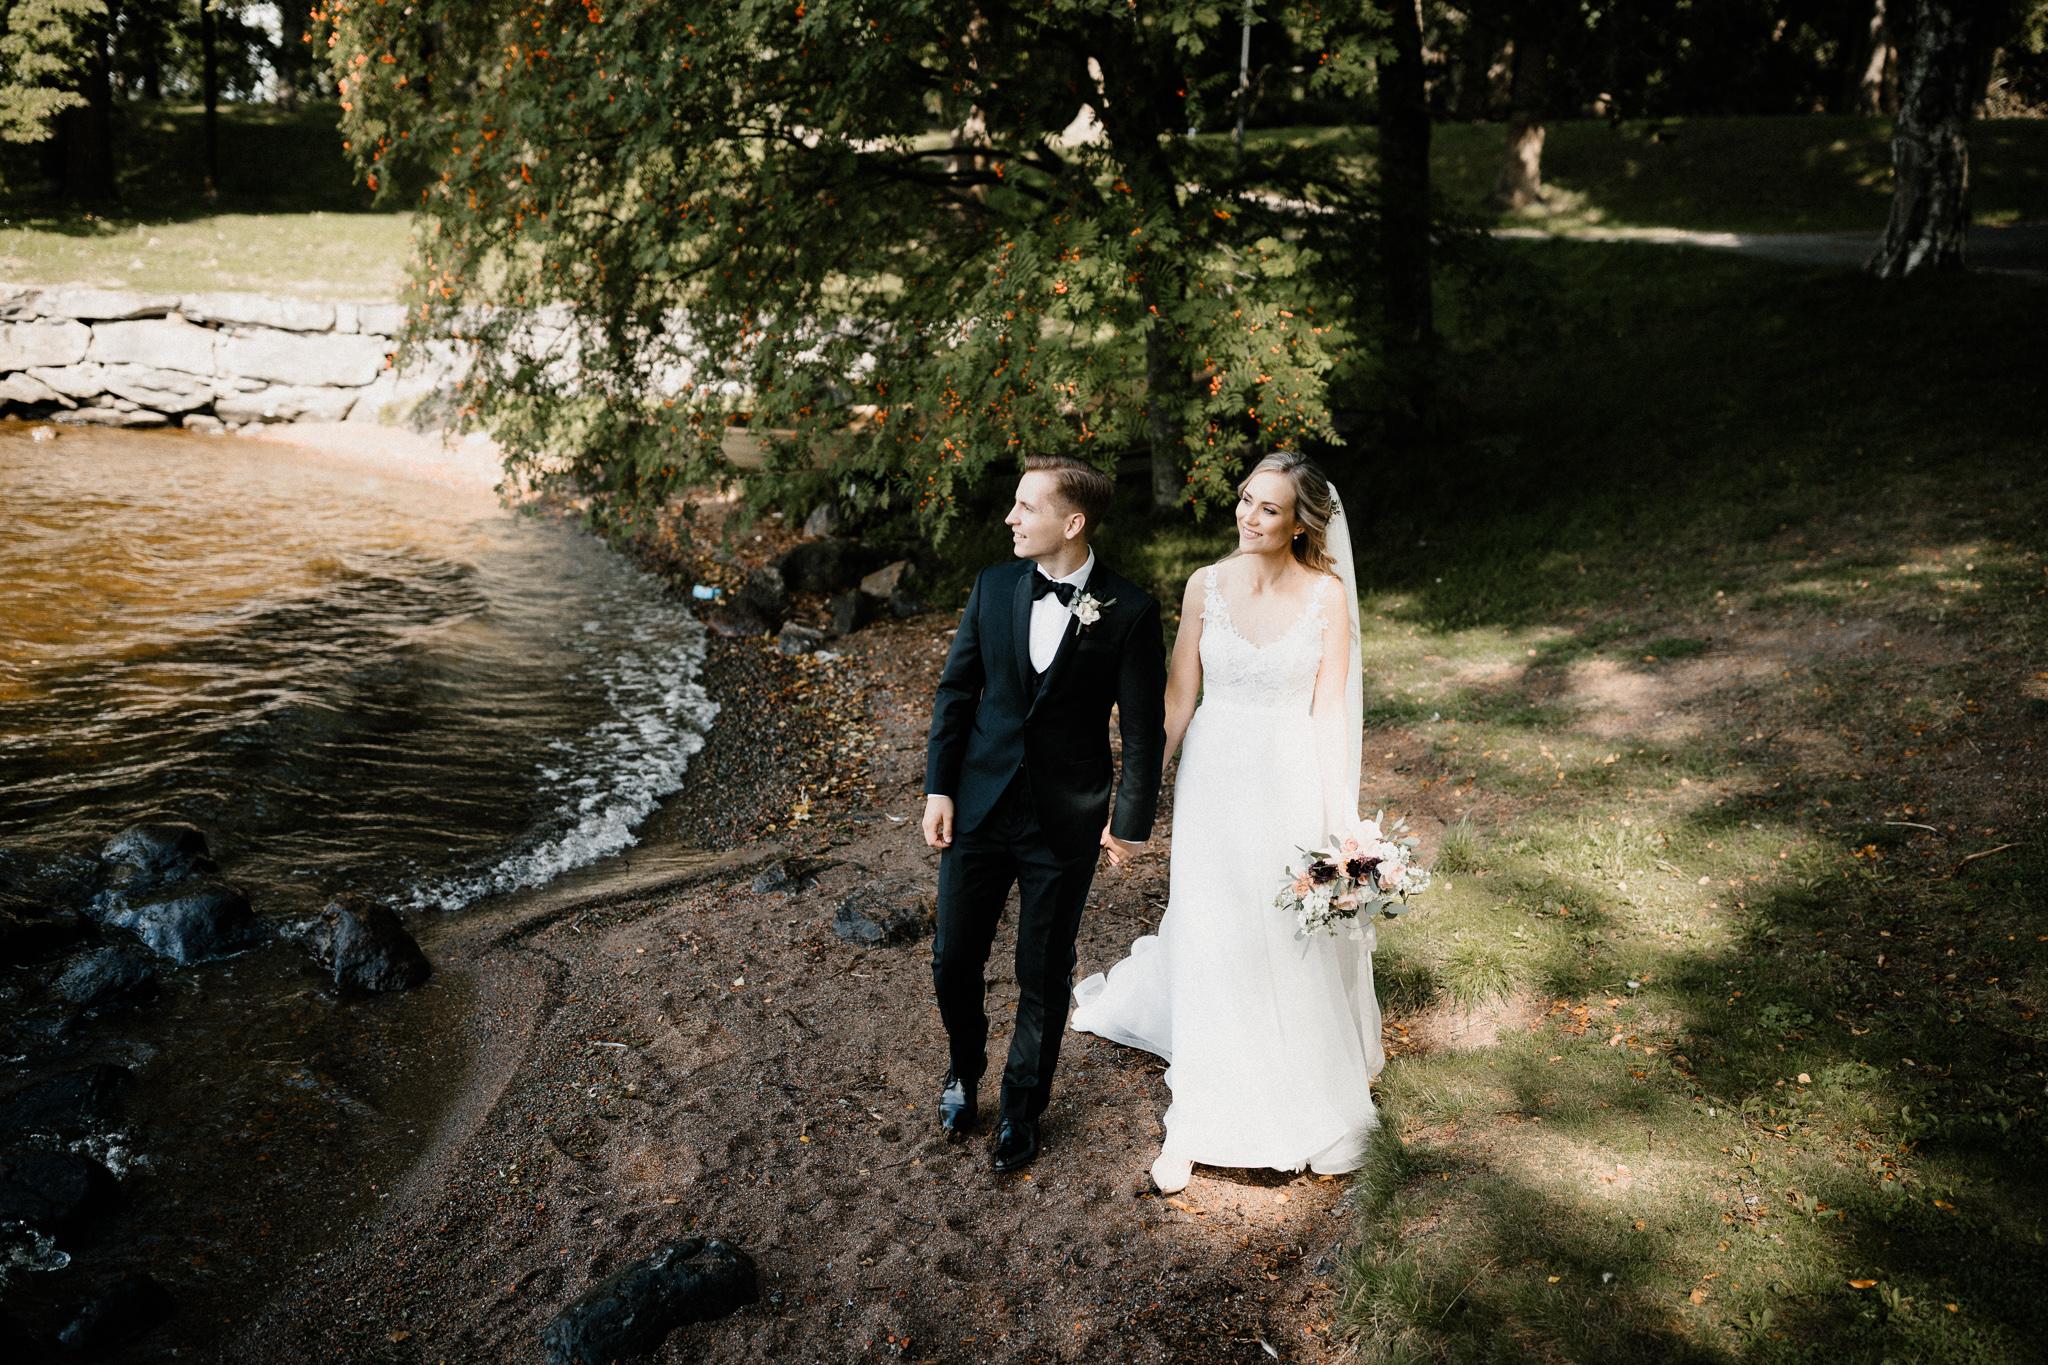 Johanna + Mikko - Tampere - Photo by Patrick Karkkolainen Wedding Photographer-30.jpg